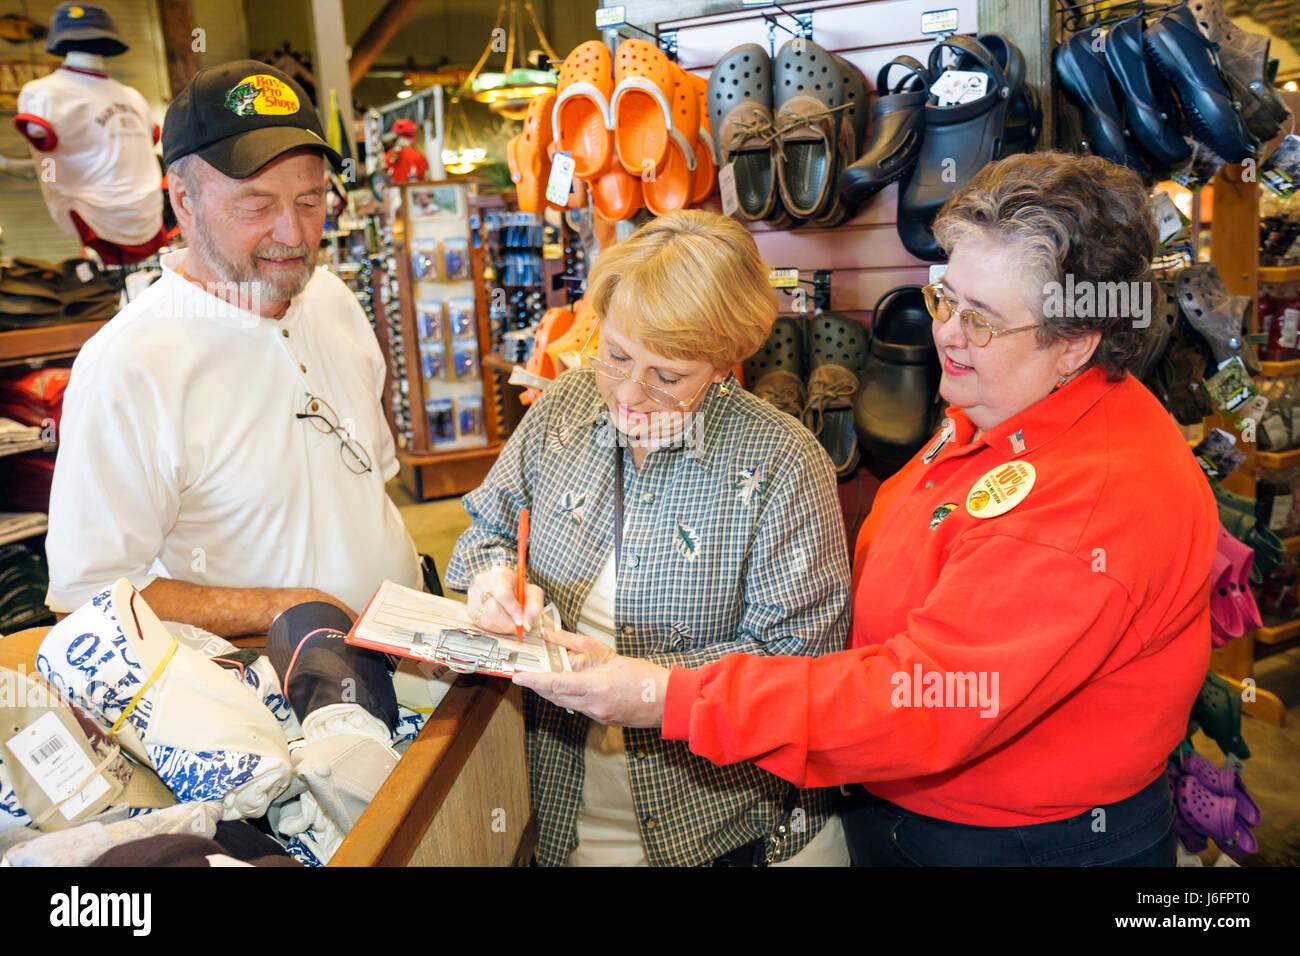 Tennessee Sevierville Kodak Bass Pro Shops, formulario de solicitud de crédito hombre mujer mujeres pareja Imagen De Stock